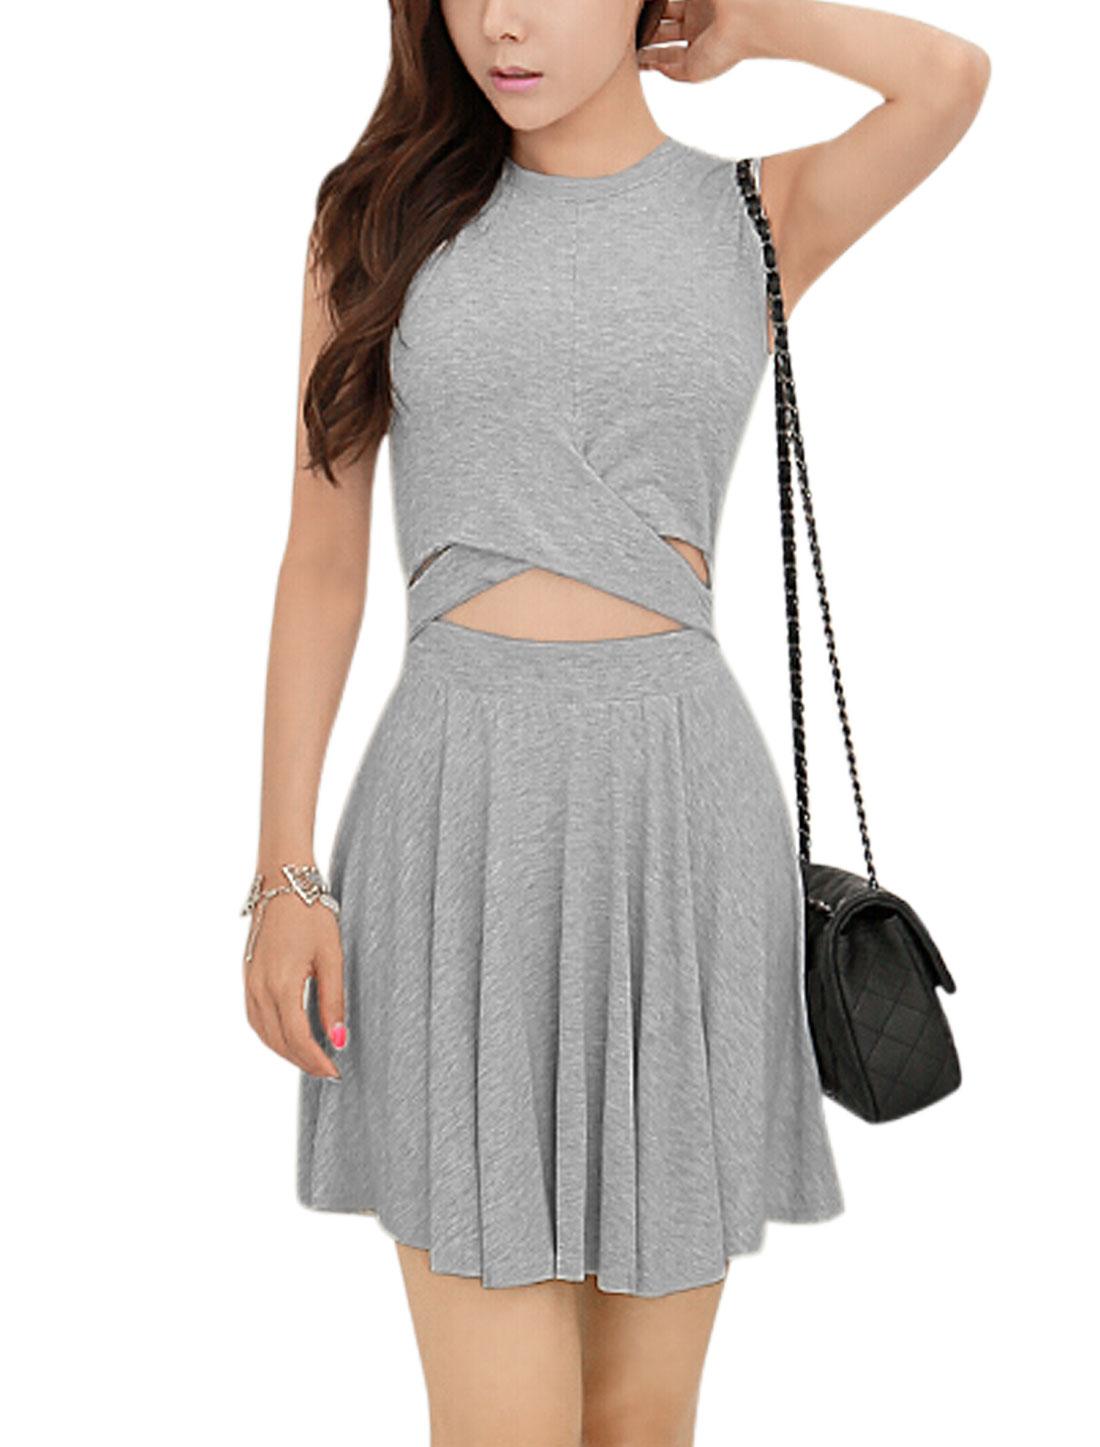 Women Round Neck Sleeveless Crossover Design A Line Dress Light Gray S